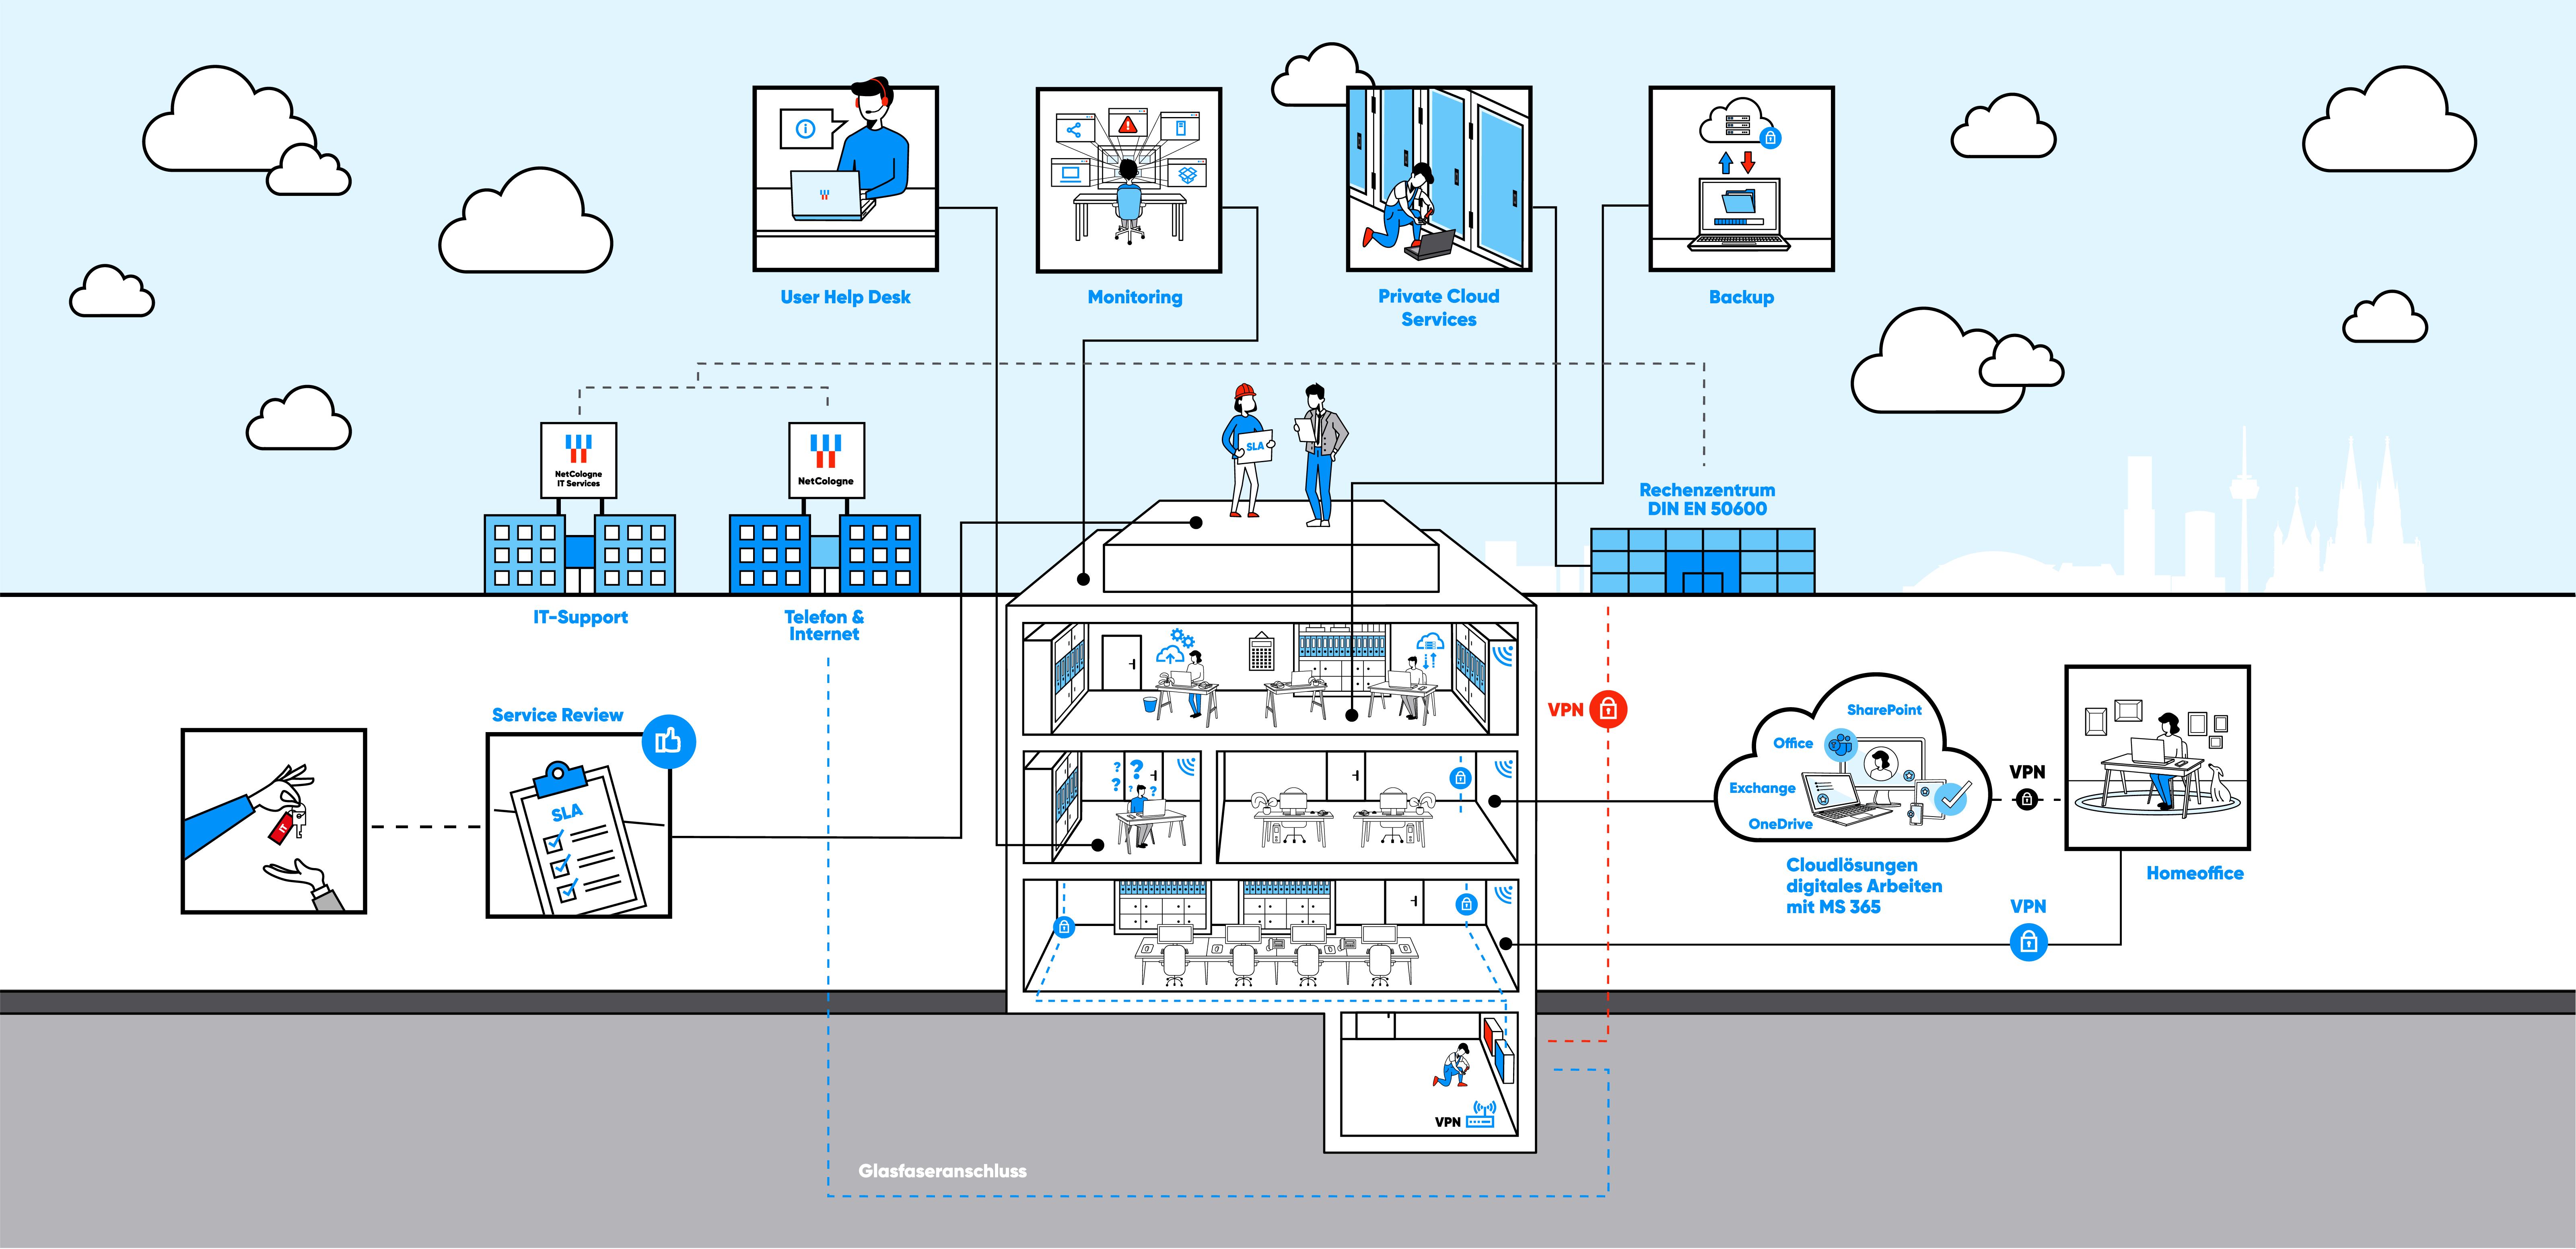 Infografik zur Veranschaulichung des IT-Outsourcings bei NetCologne ITS